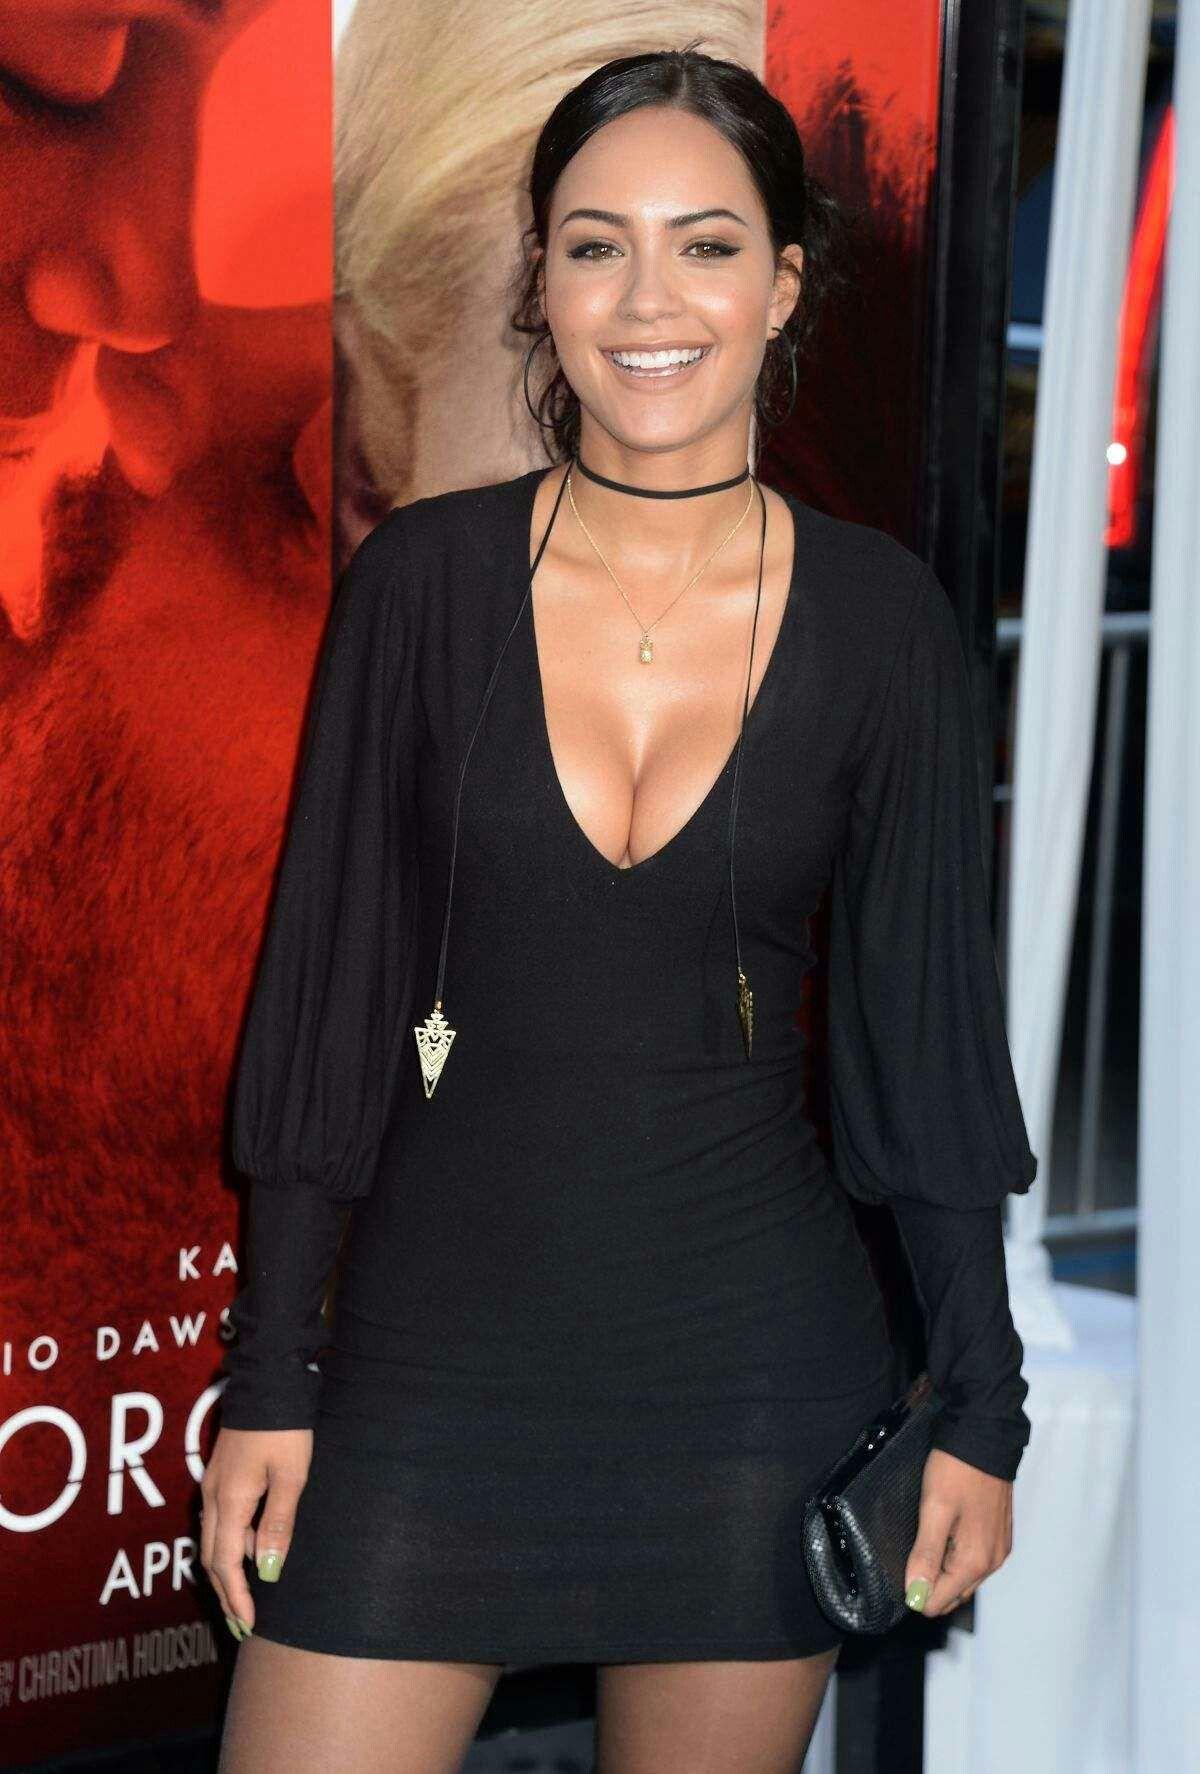 Eugenia Diordiychuk Ukraine,Brandy Norwood born February 11, 1979 (age 39) Hot pics & movies Christine Pedi,Jonathan Torrens